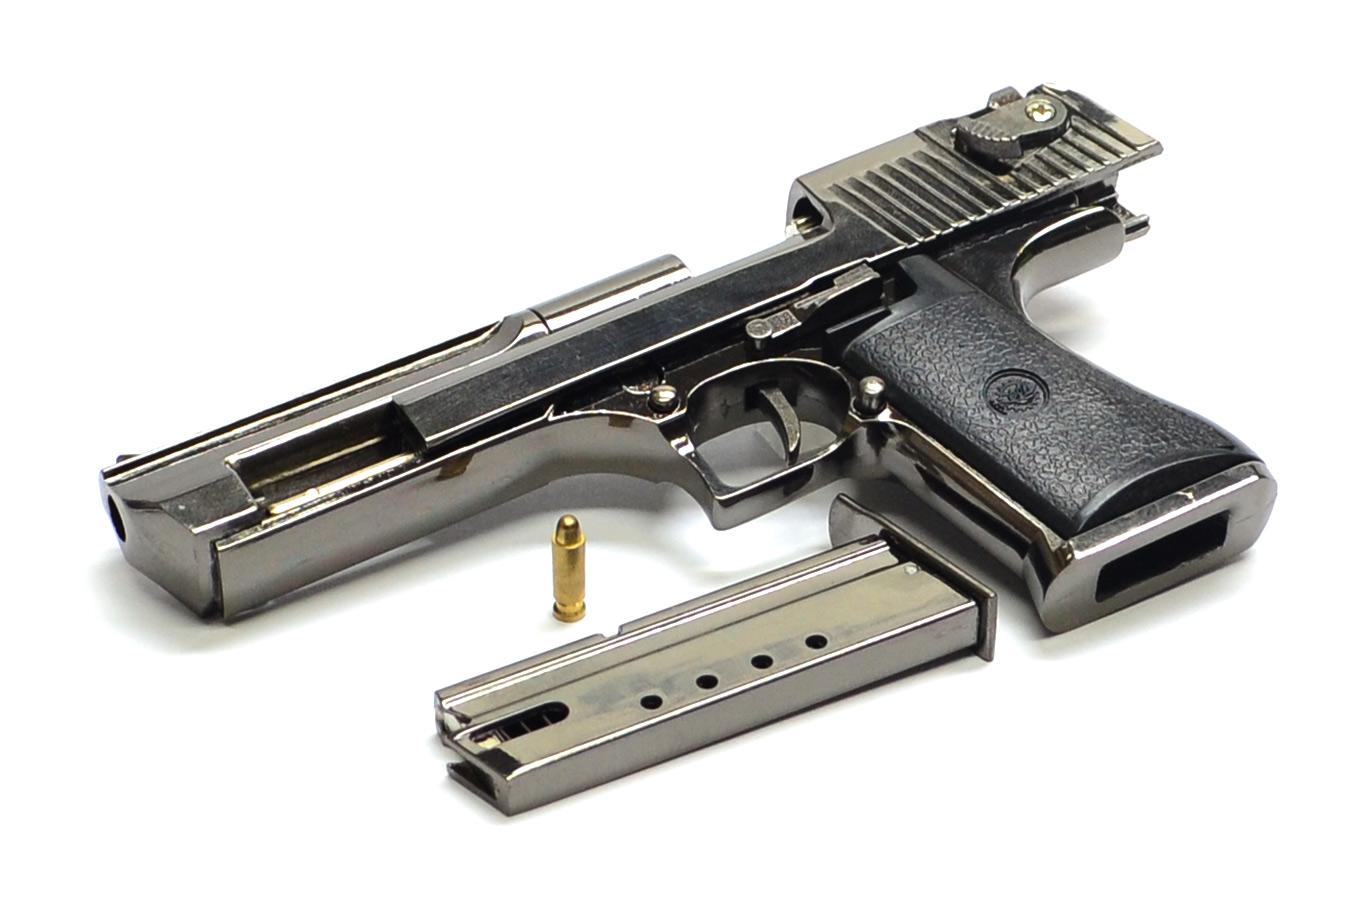 Макет пистолета Desert Eagle в масштабе 1:2